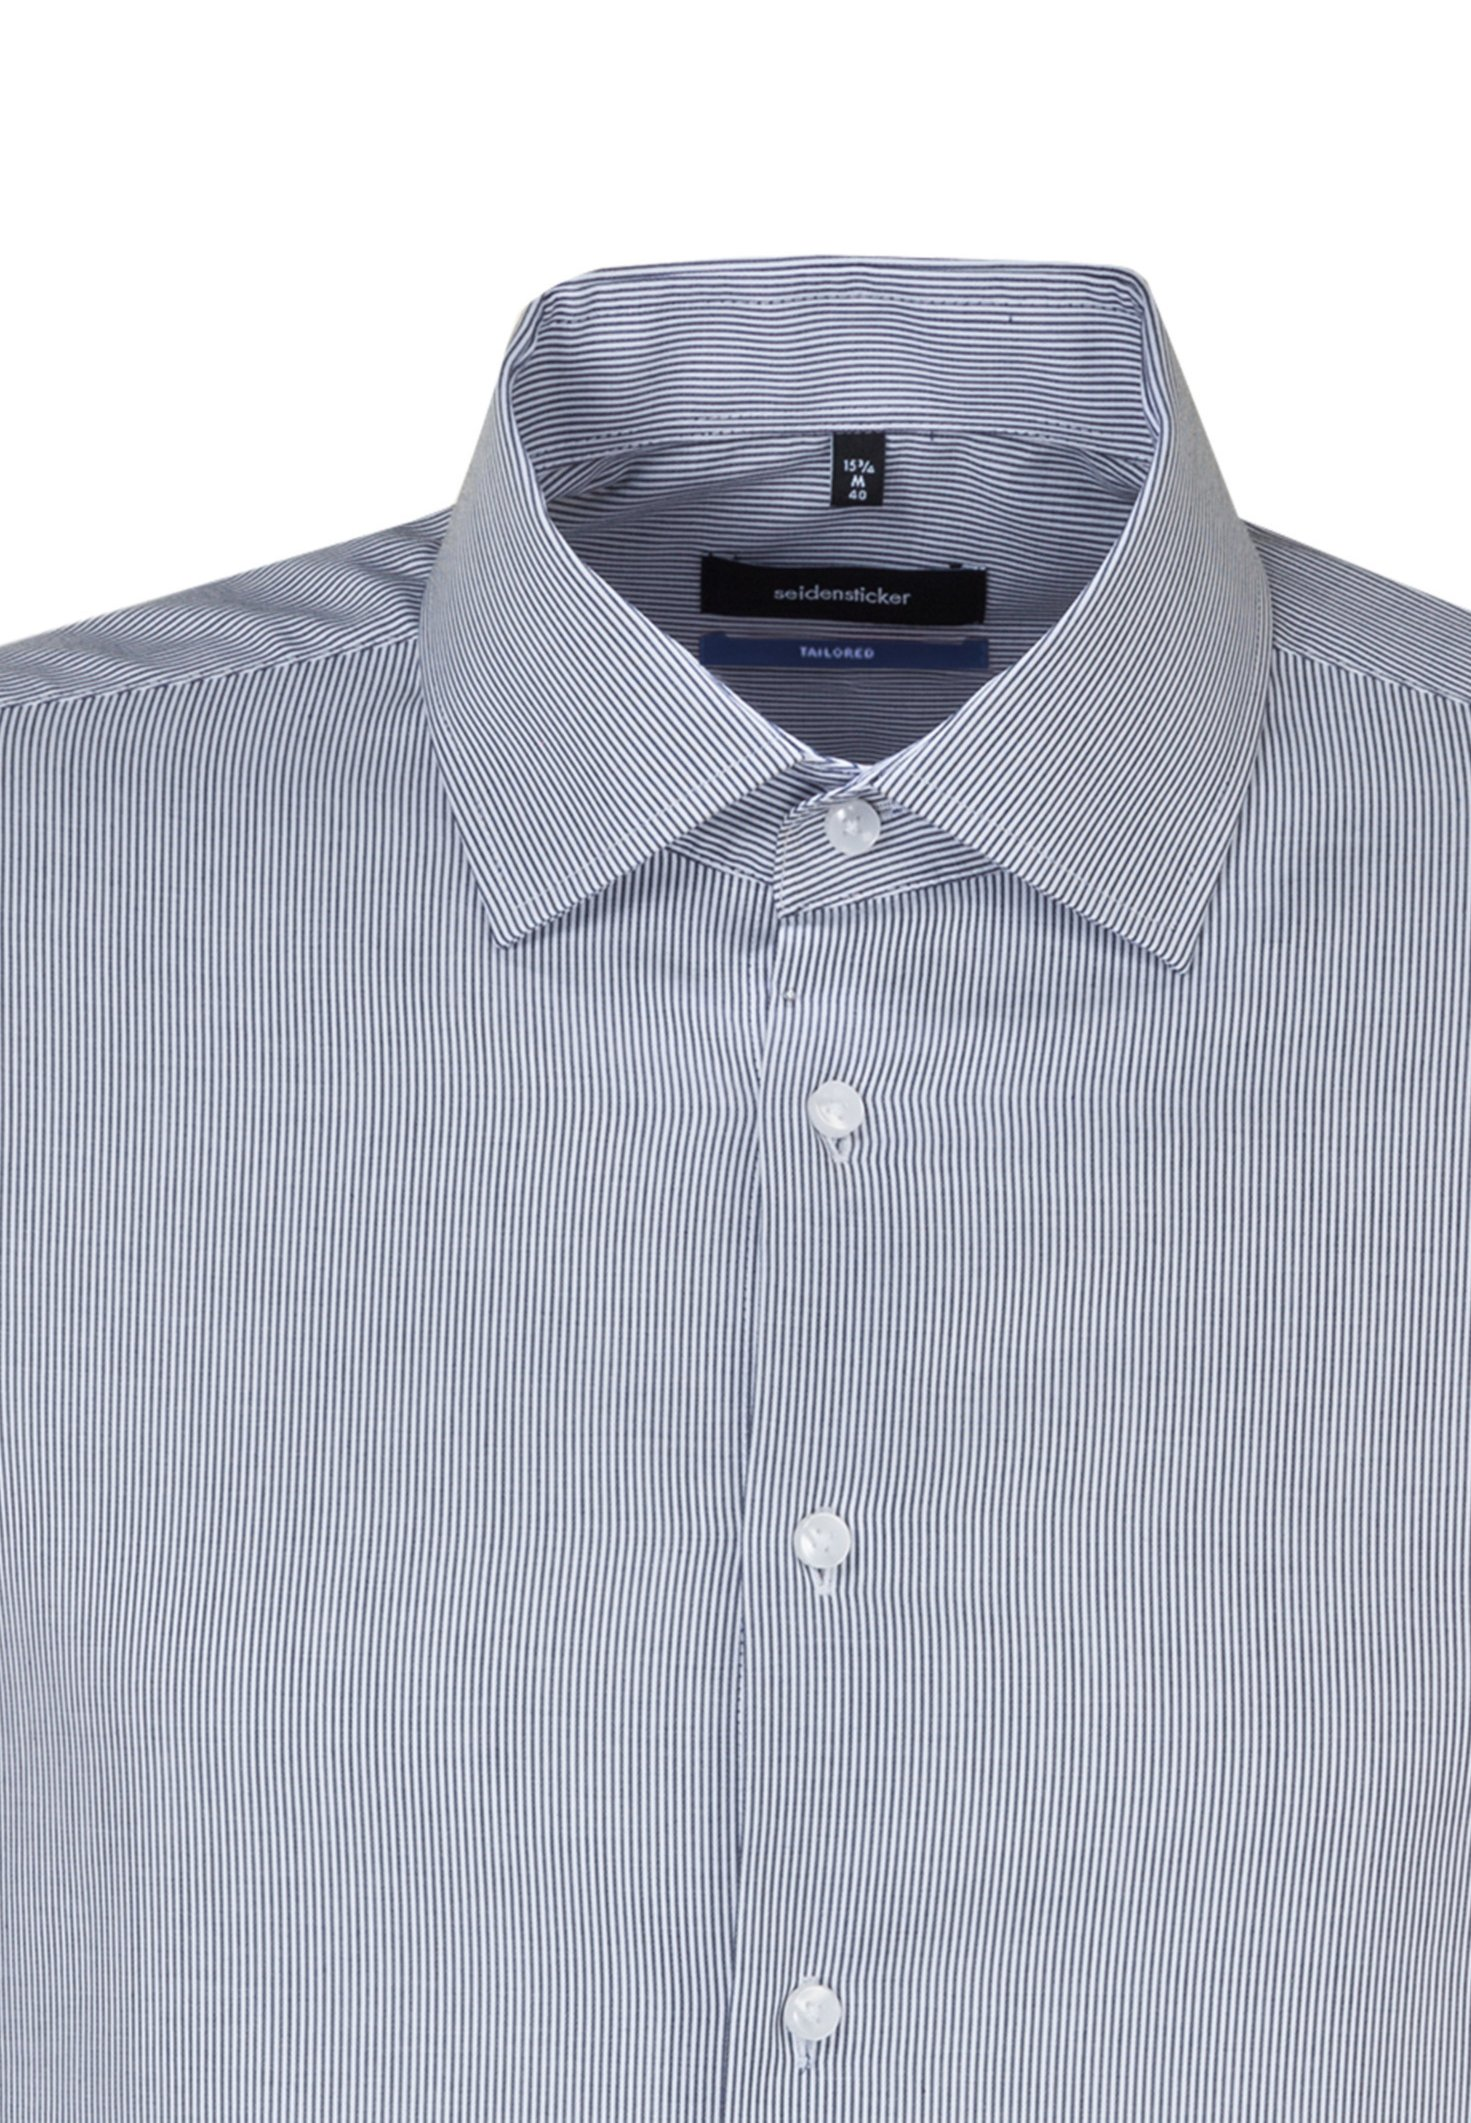 Seidensticker TAILORED - Businesshemd blue